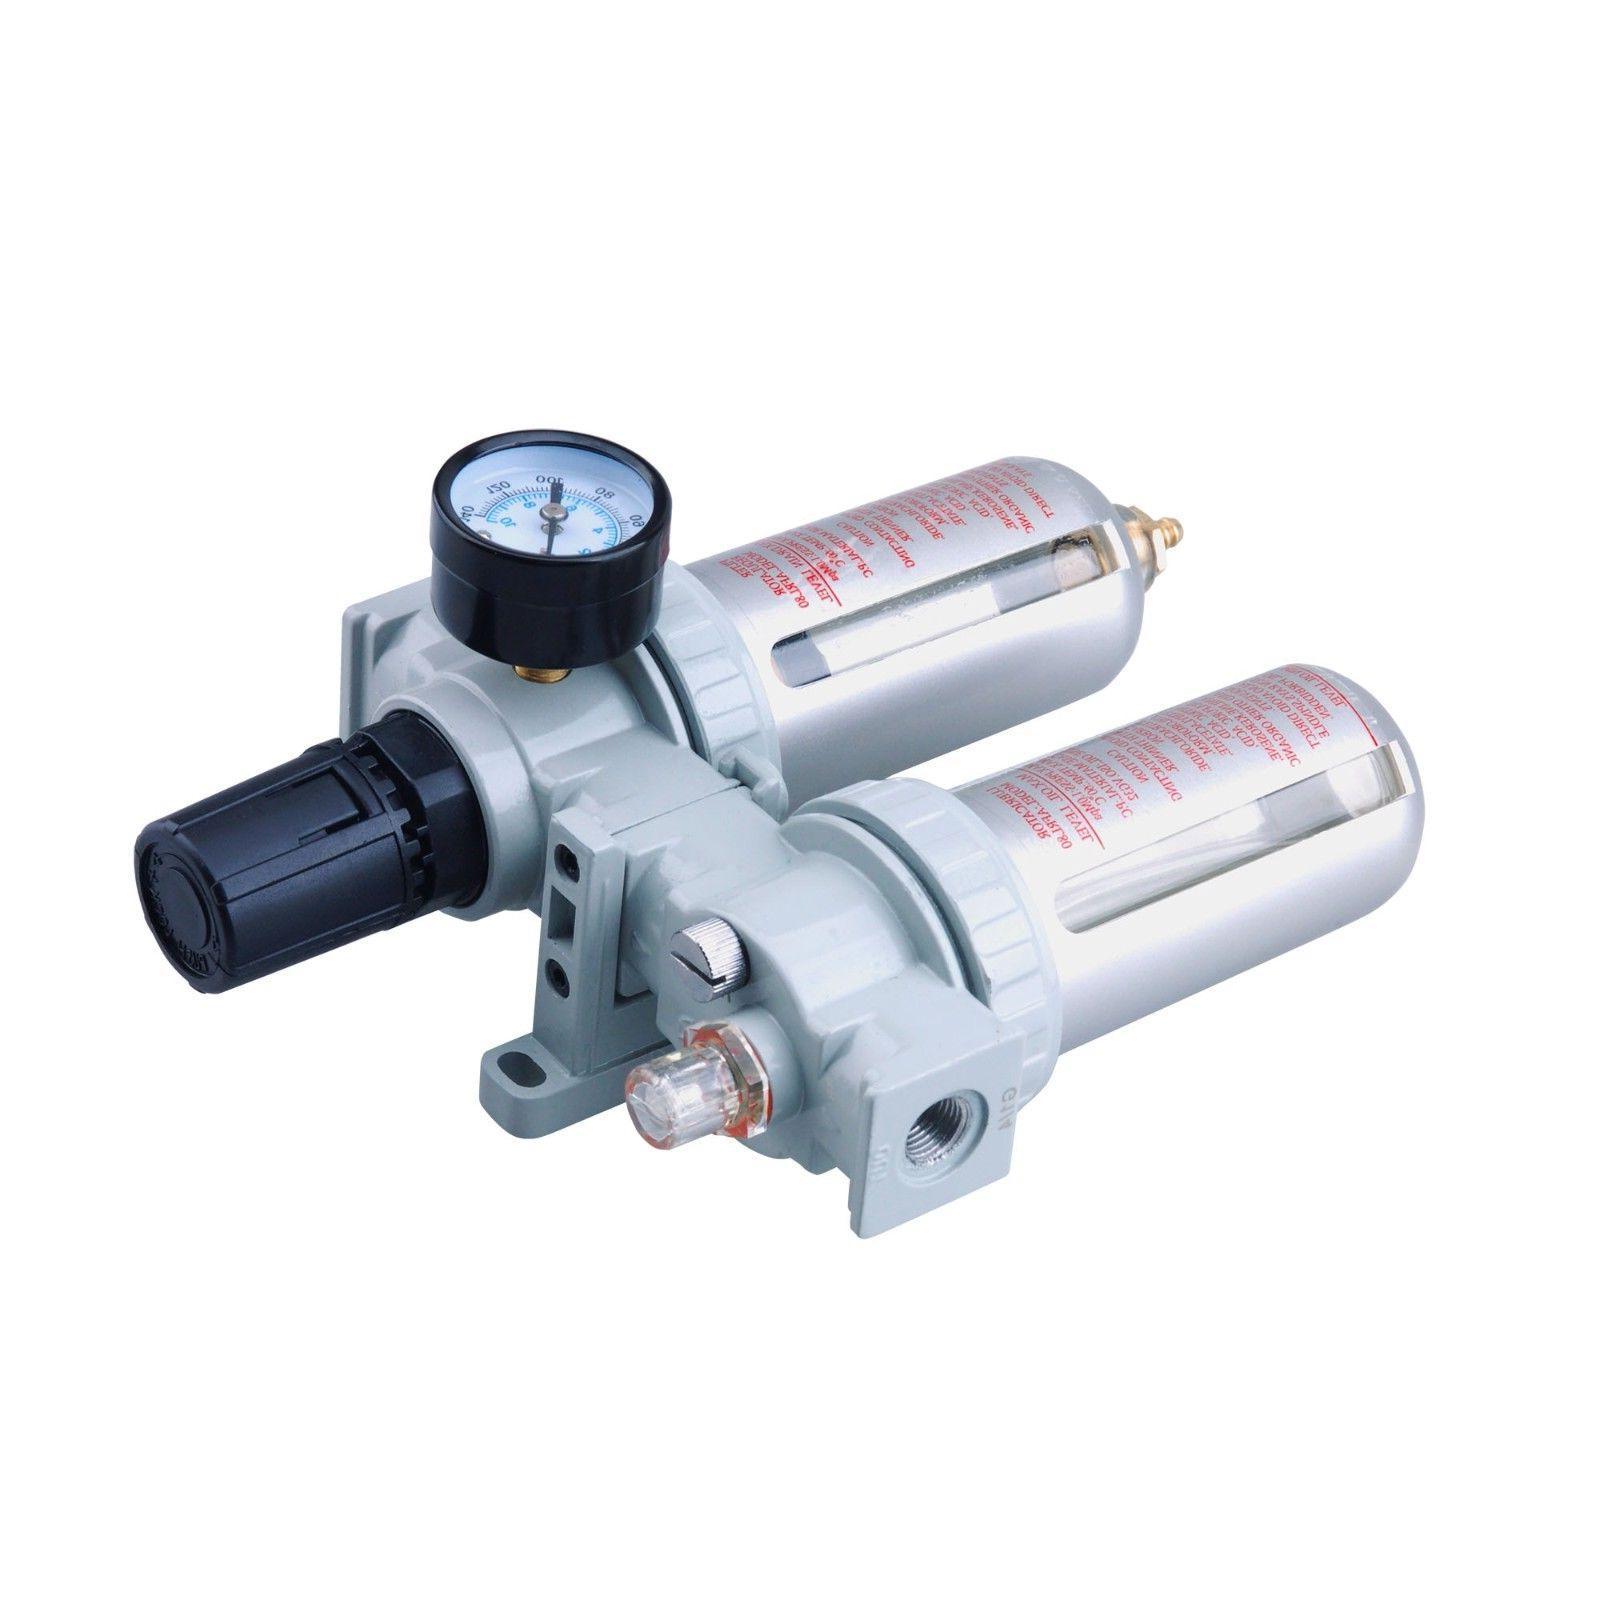 air control unit filter regulator and lubricator